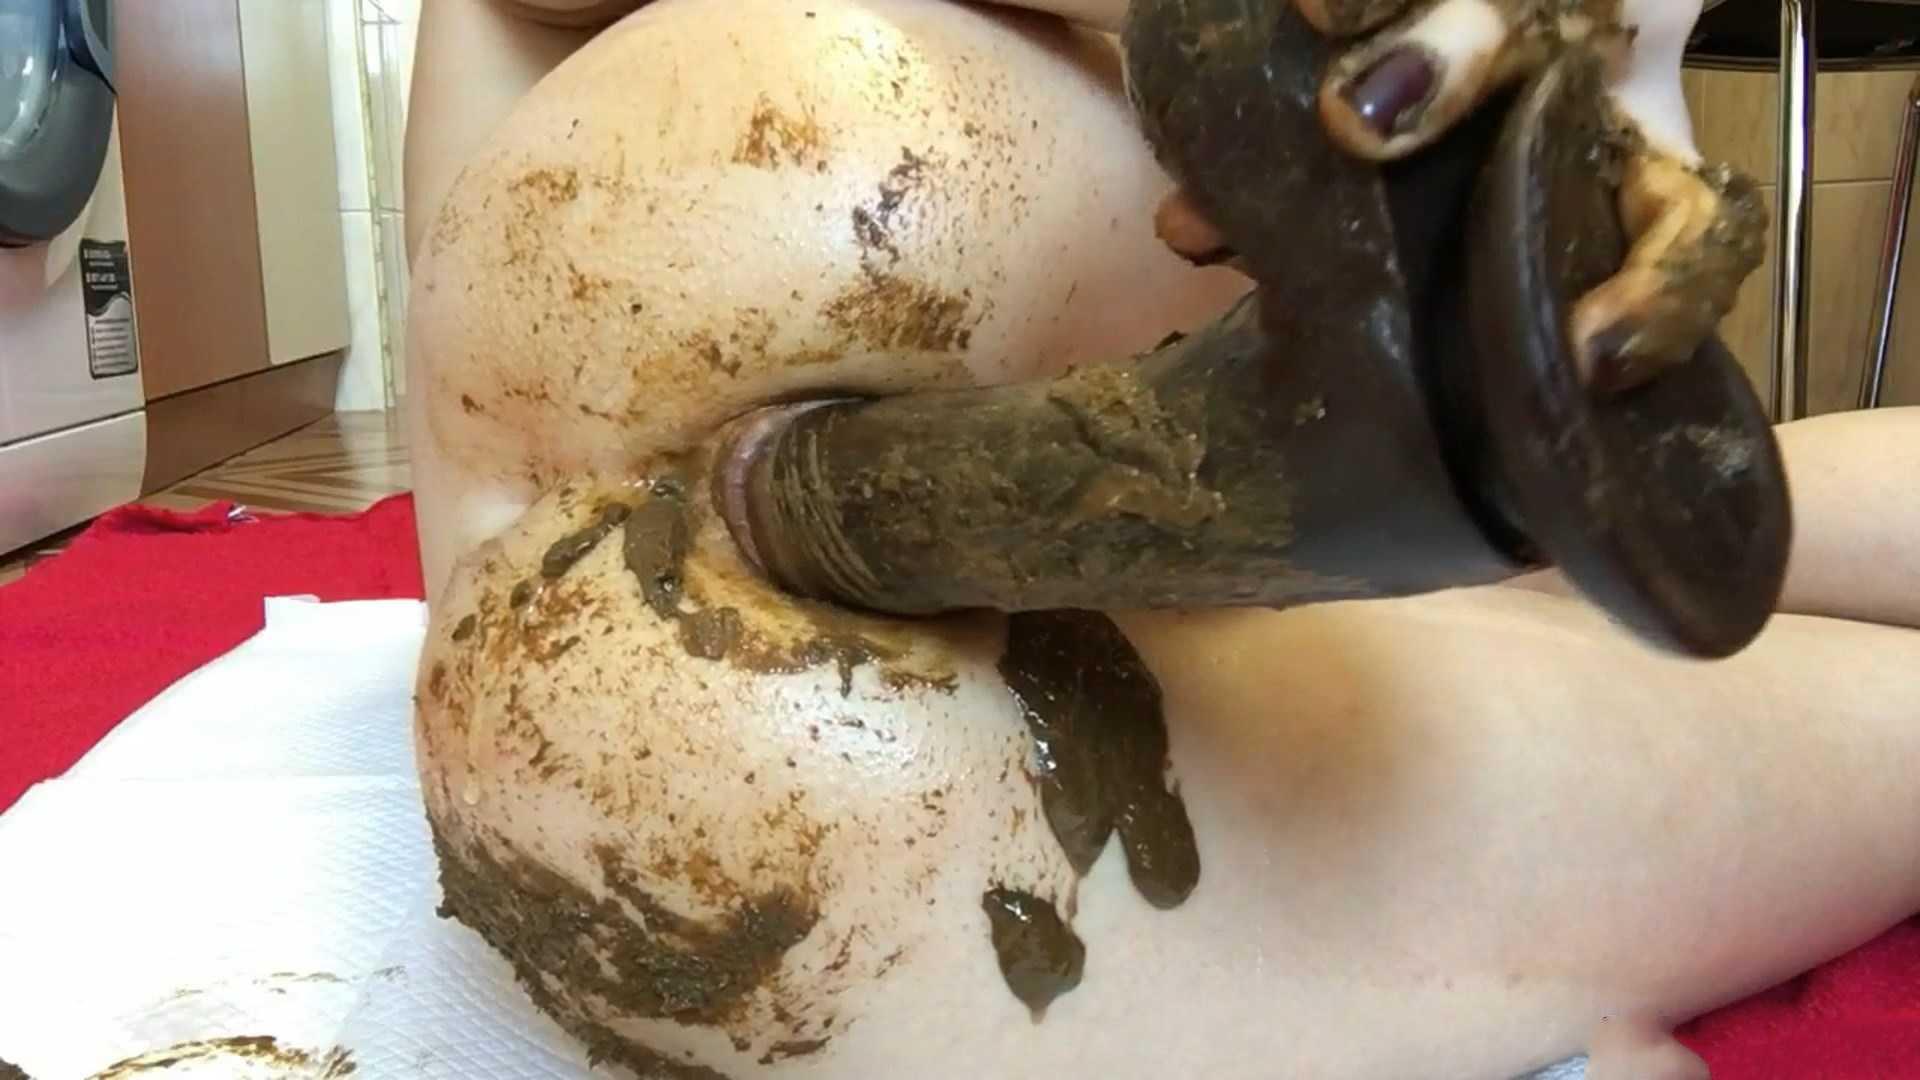 Close up poopoo hole fisting - EllaGilbert | Full HD 1080p | June 11, 2017